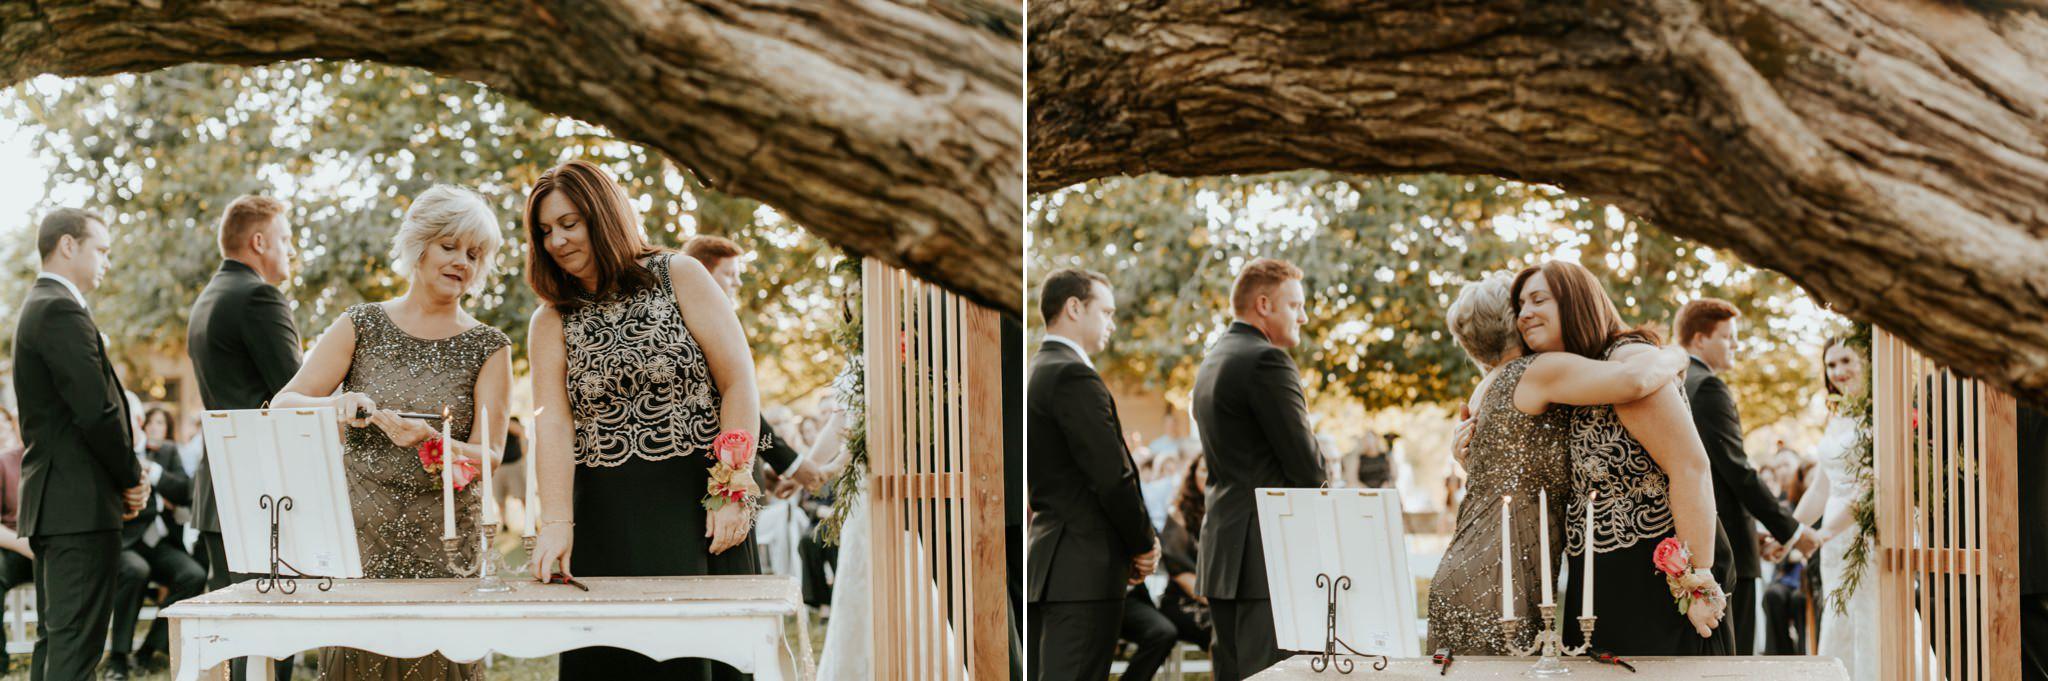 17-09-15 Lindsey and Brandon Wedding Edited-696_WEB.jpg